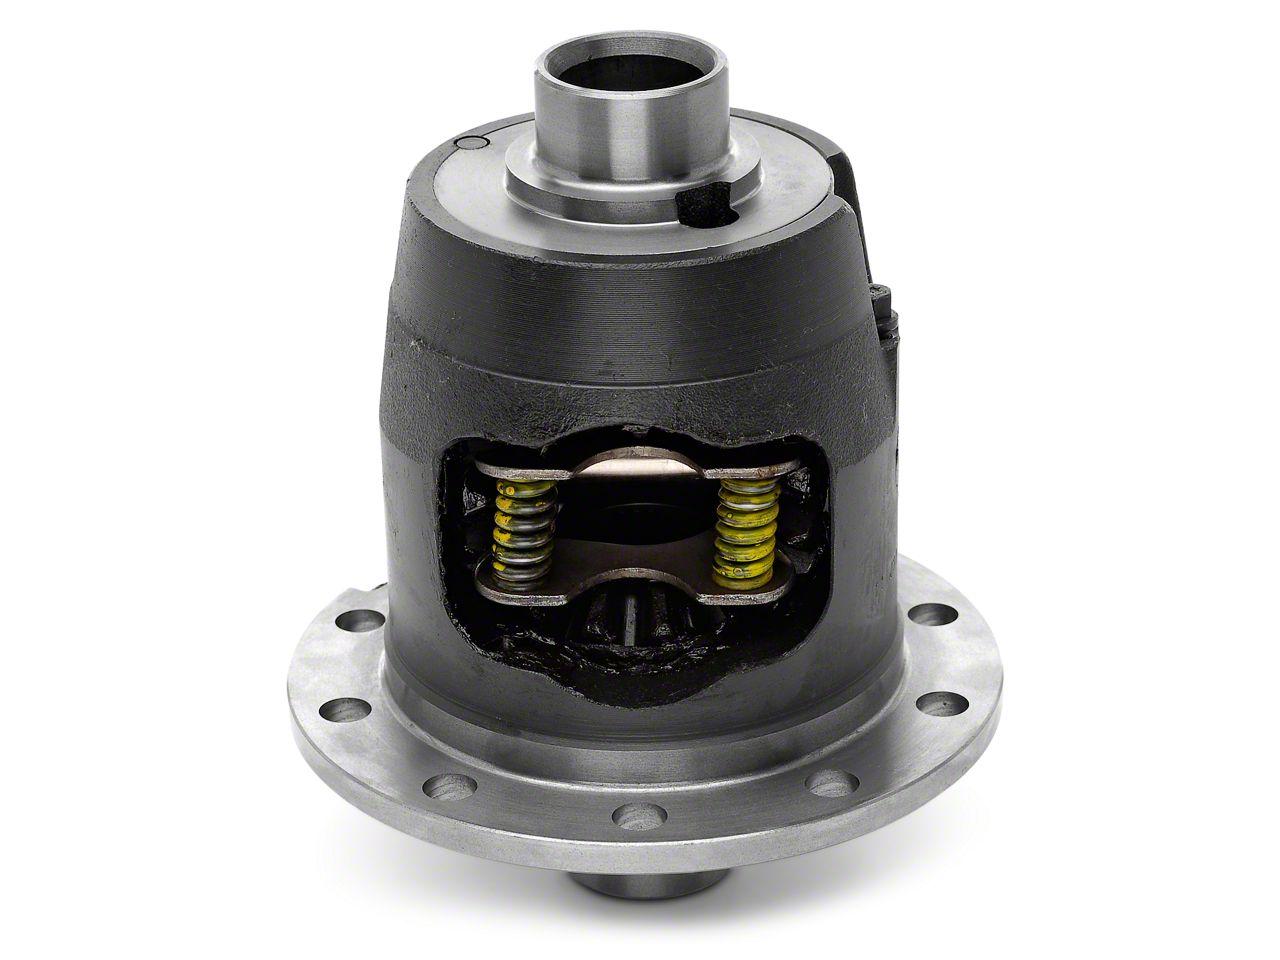 Auburn Gear HP Series Limit Slip Differential - 28 Spline 7.5 in. (79-85 V8; 86-10 V6)